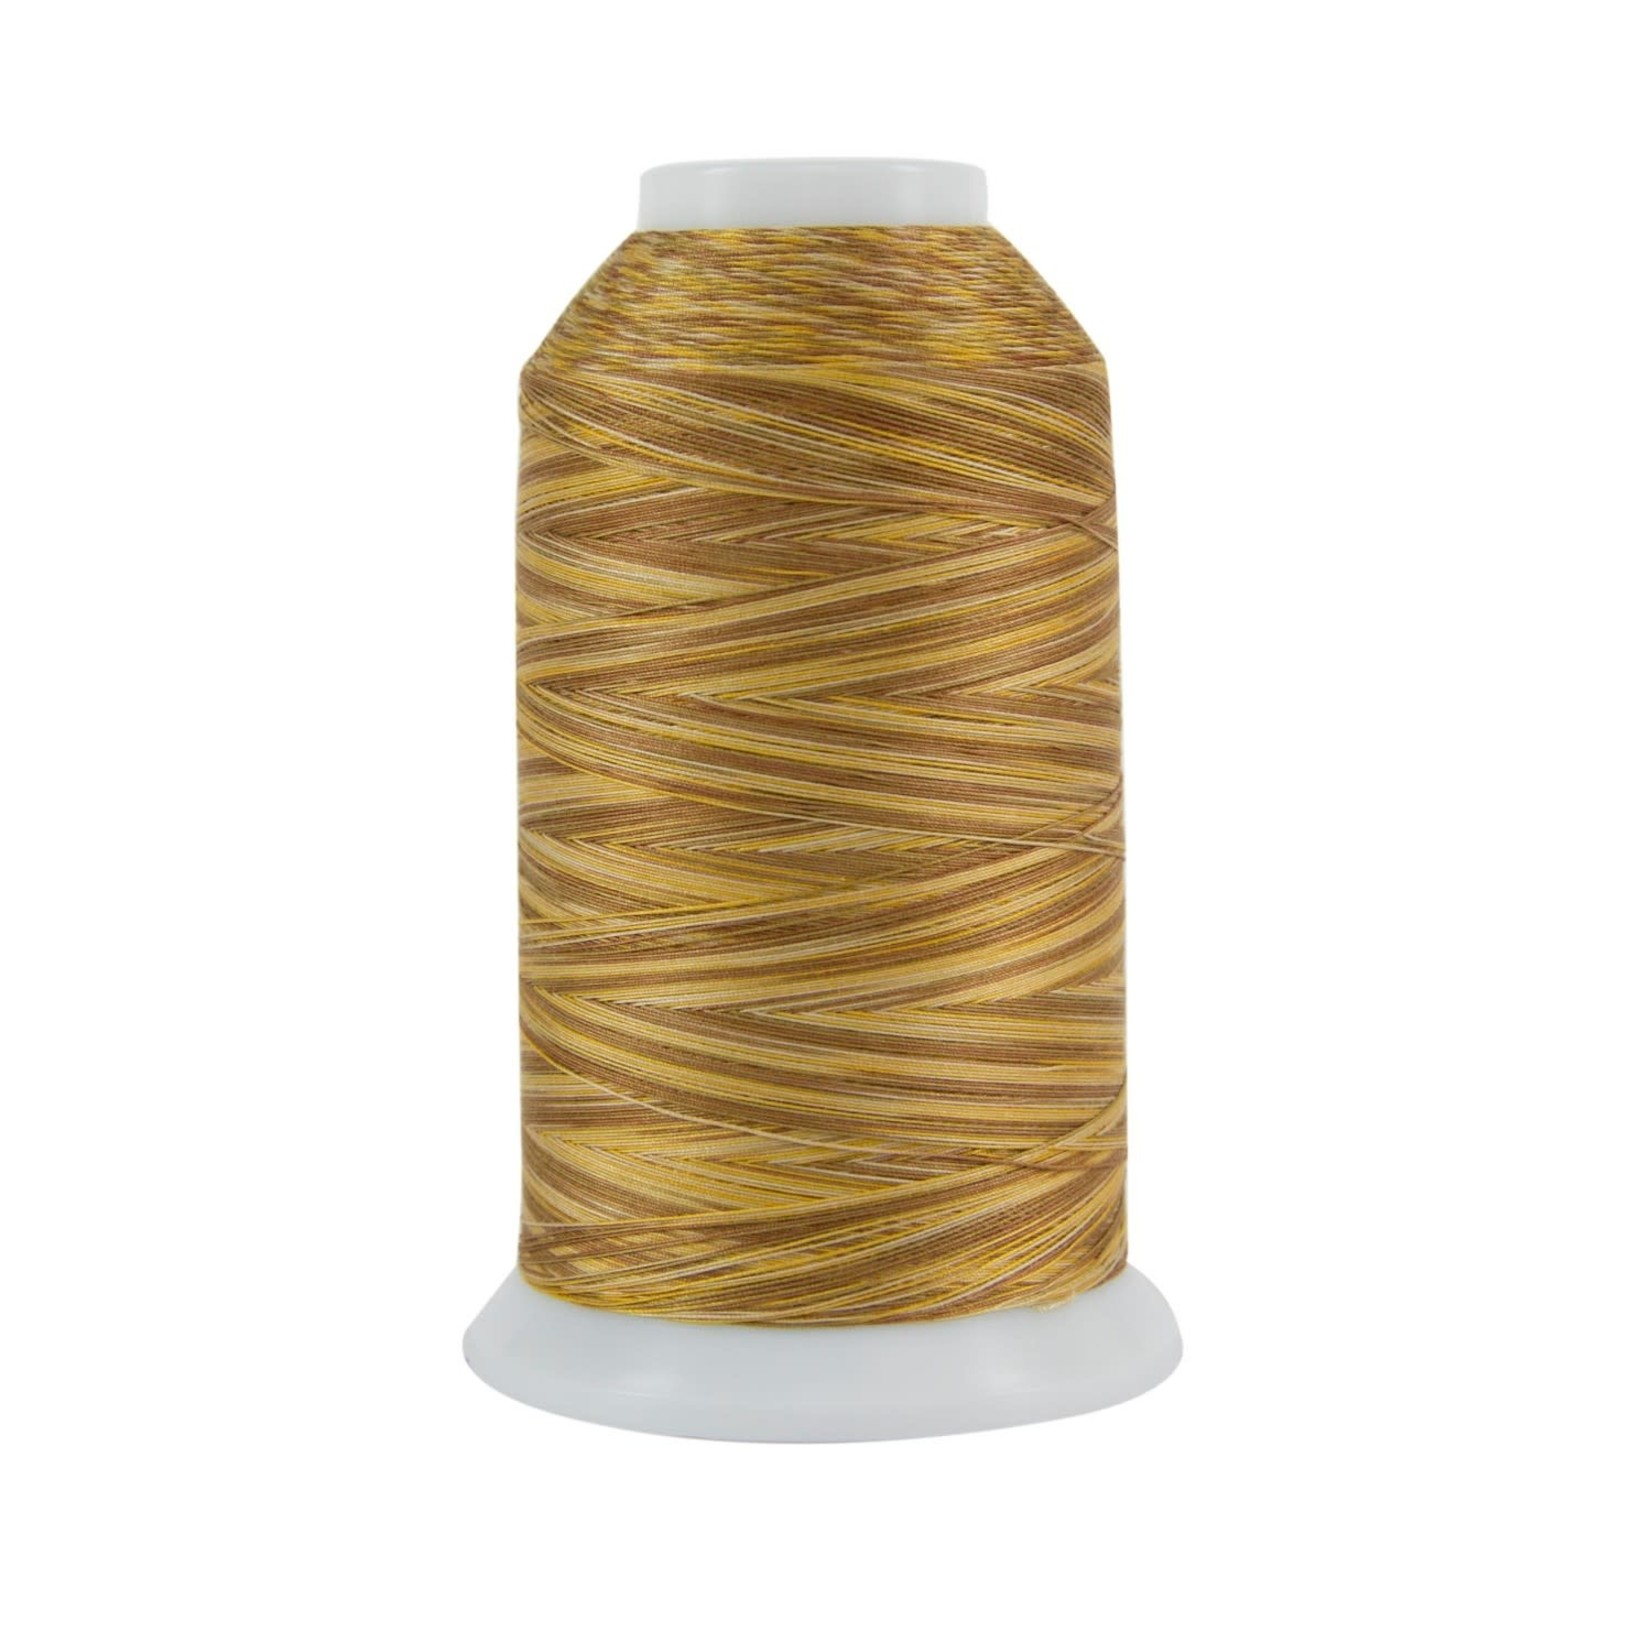 Superior Threads King Tut - #40 - 1828 m - 0991 Sahara Shadows